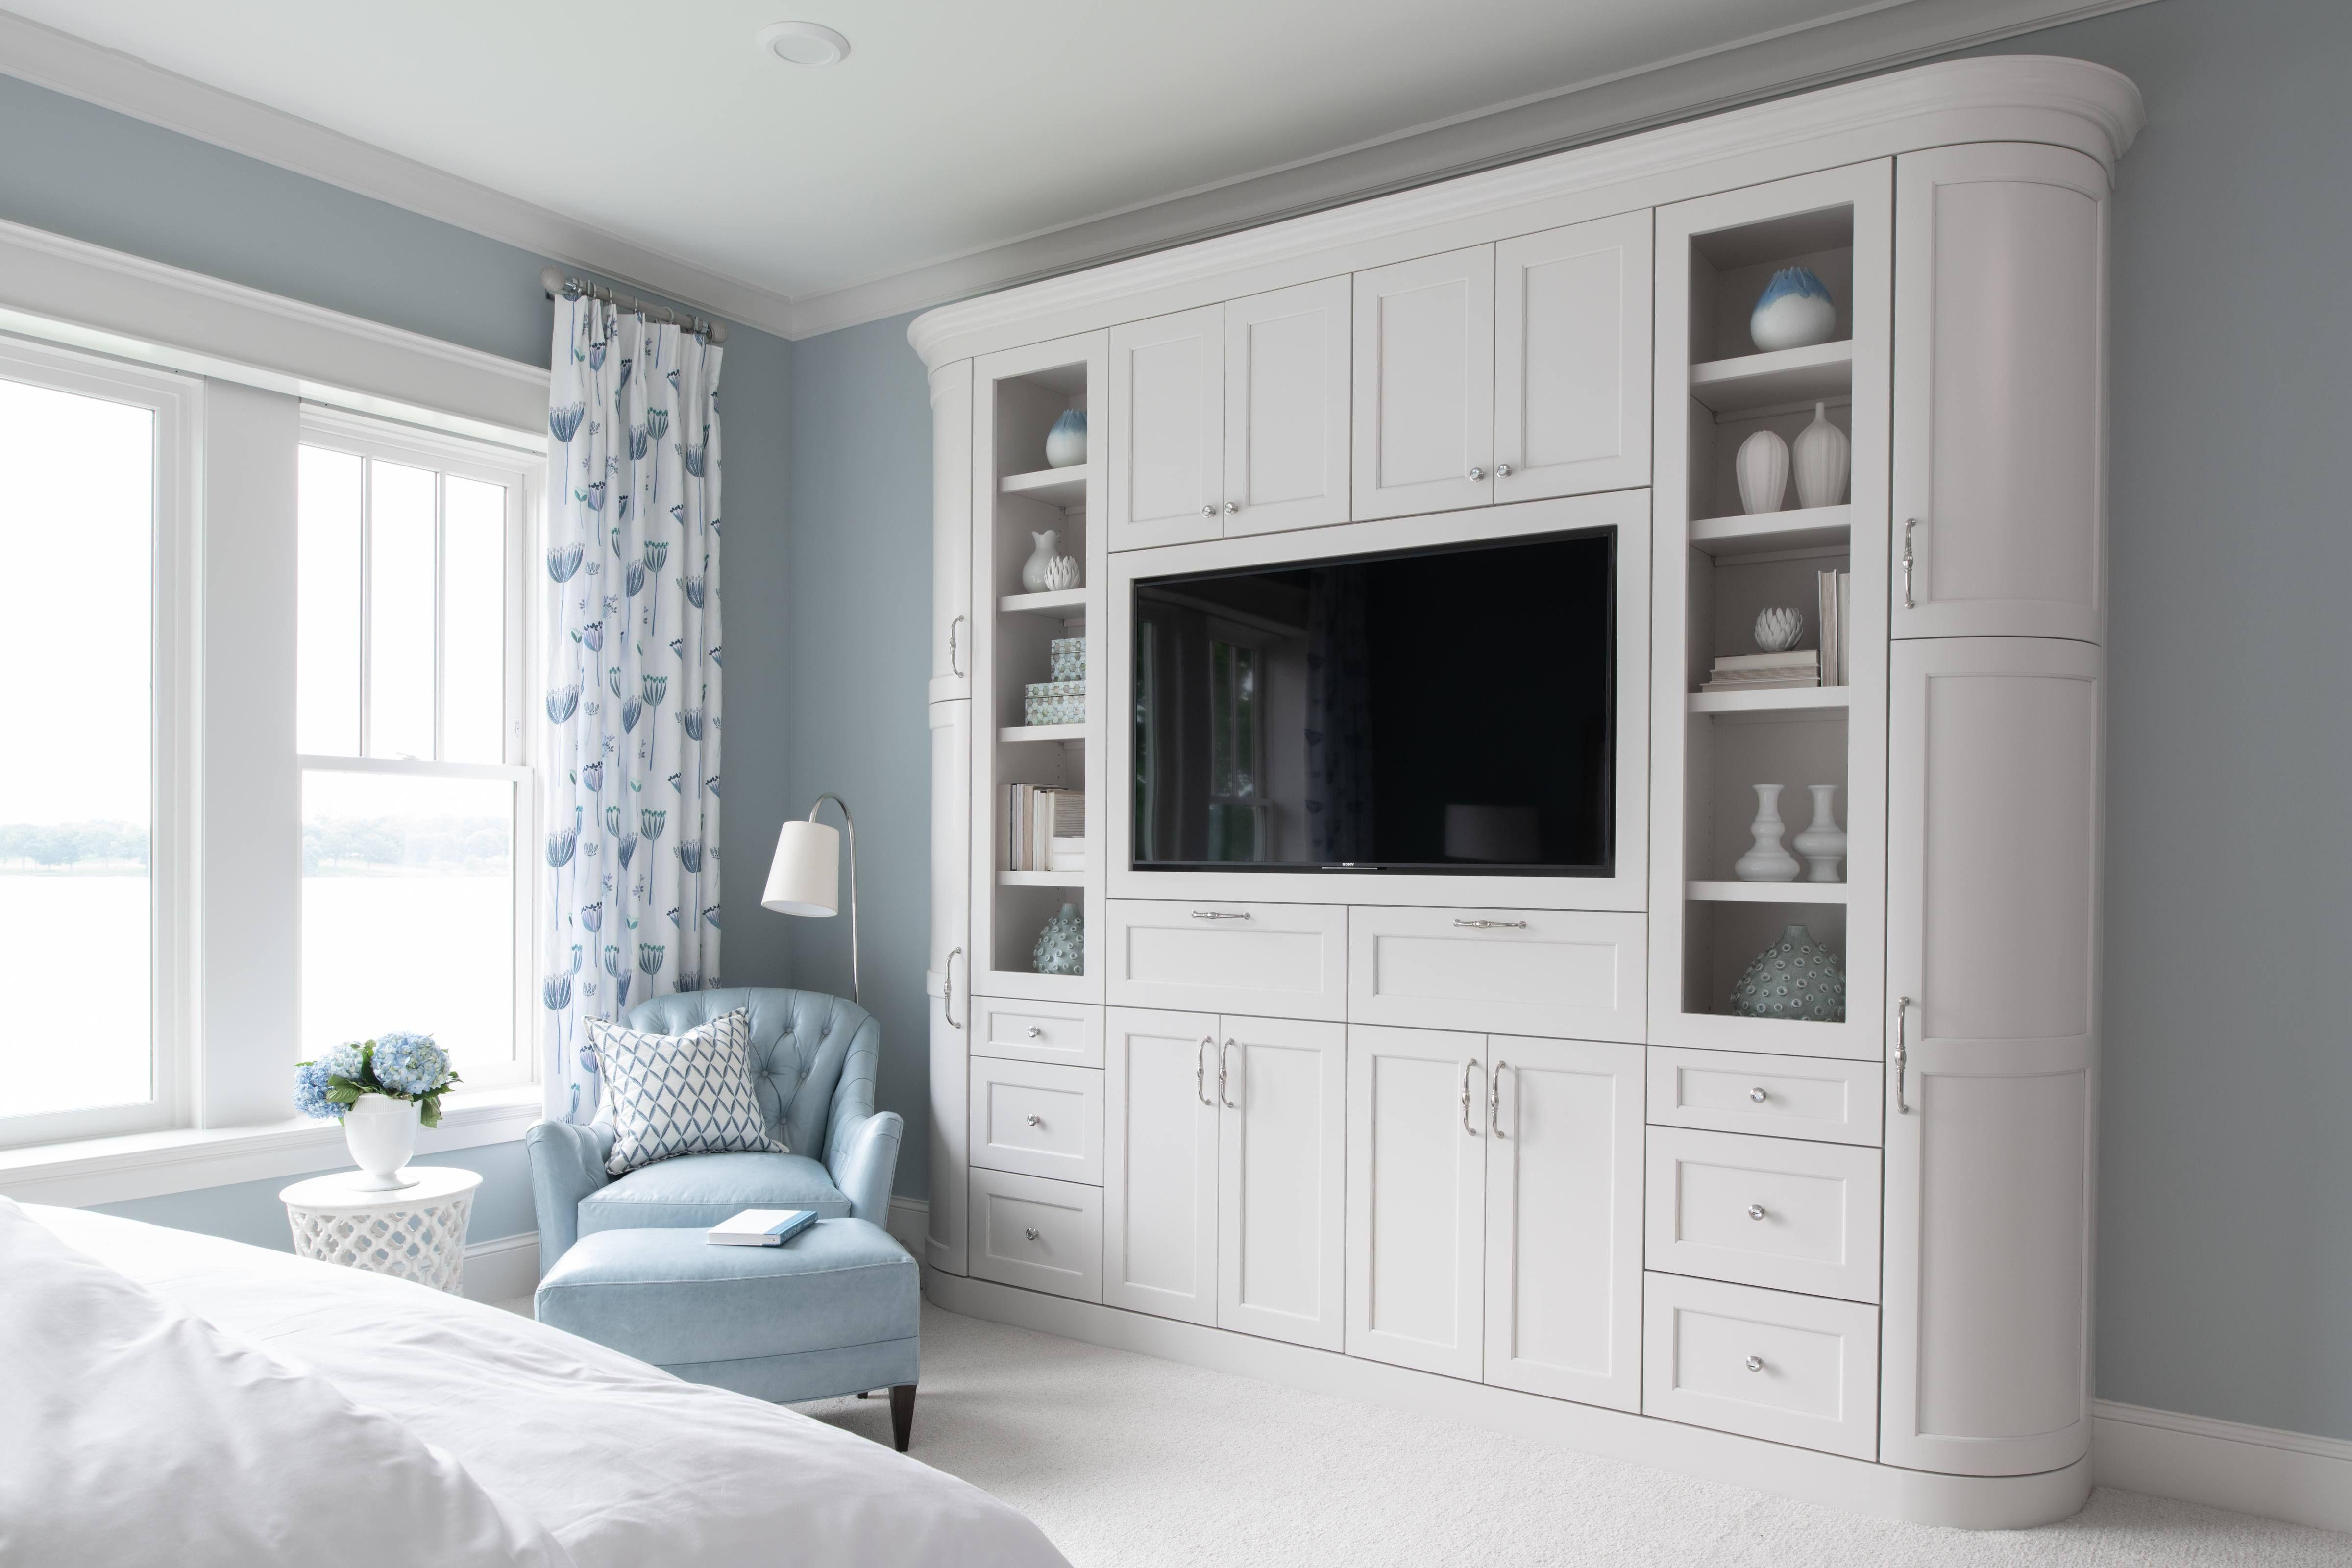 Custom Cabinetry Entertainment Center Bedroomdesign